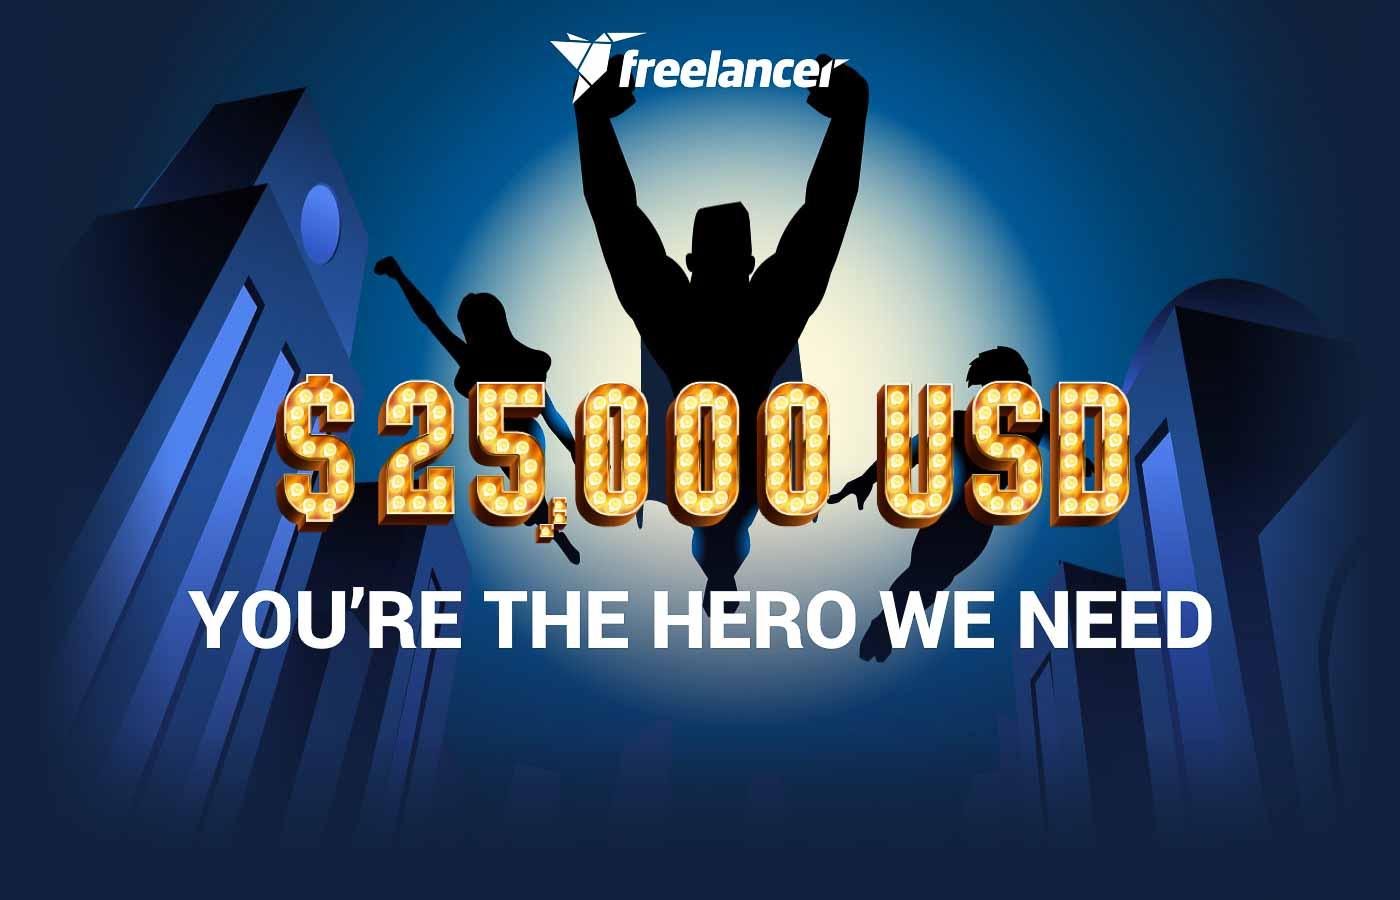 $25,000 You're the hero we need